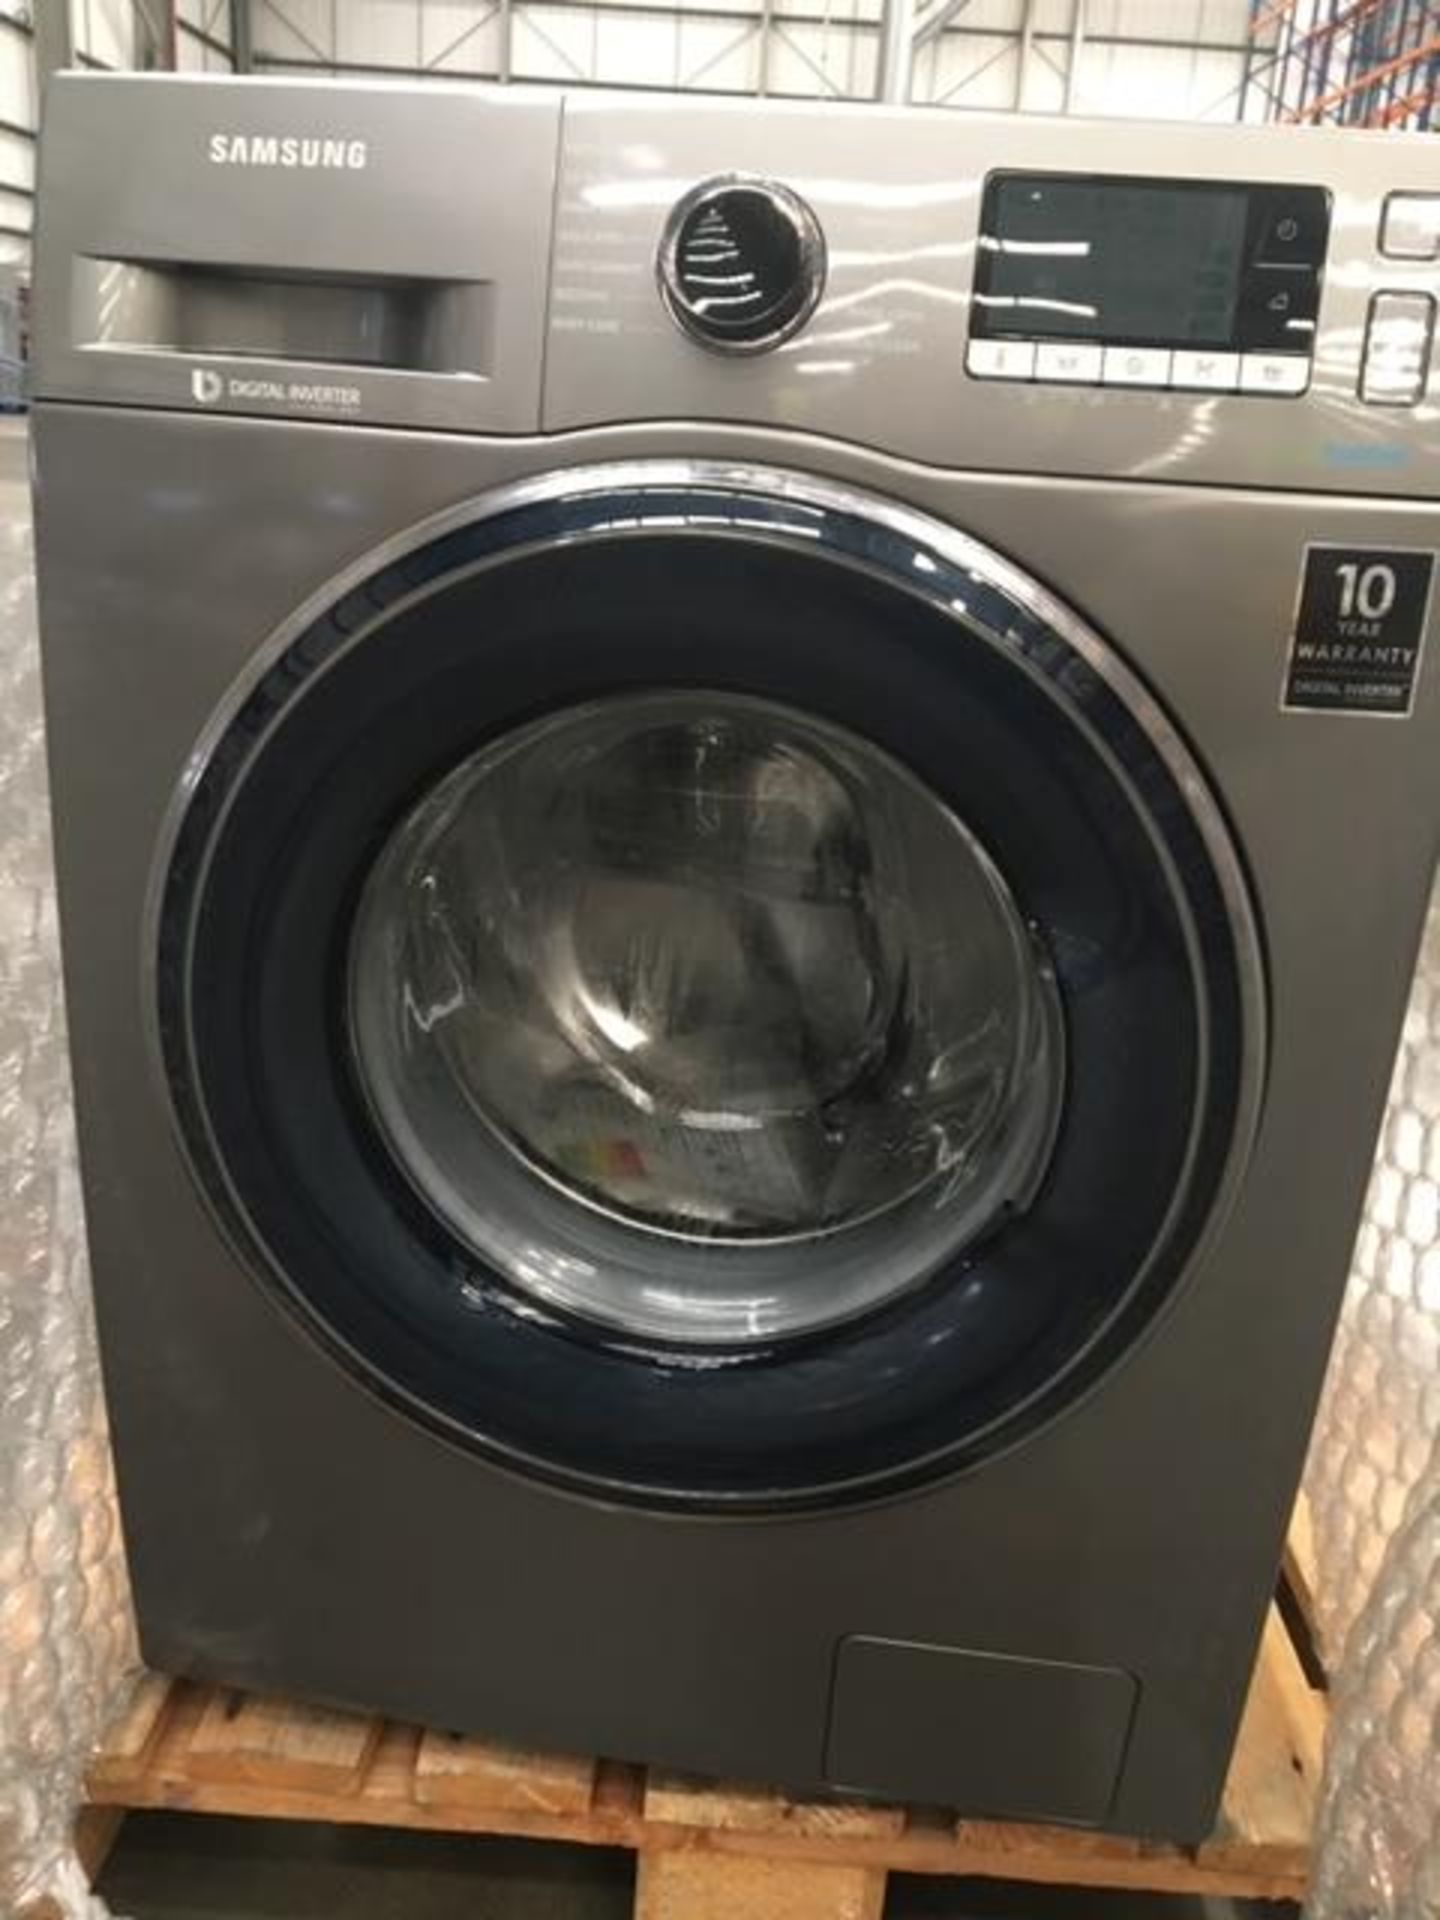 Pallet of 2 Samsung Premium Washing machines. Latest selling price £738 - Image 8 of 8